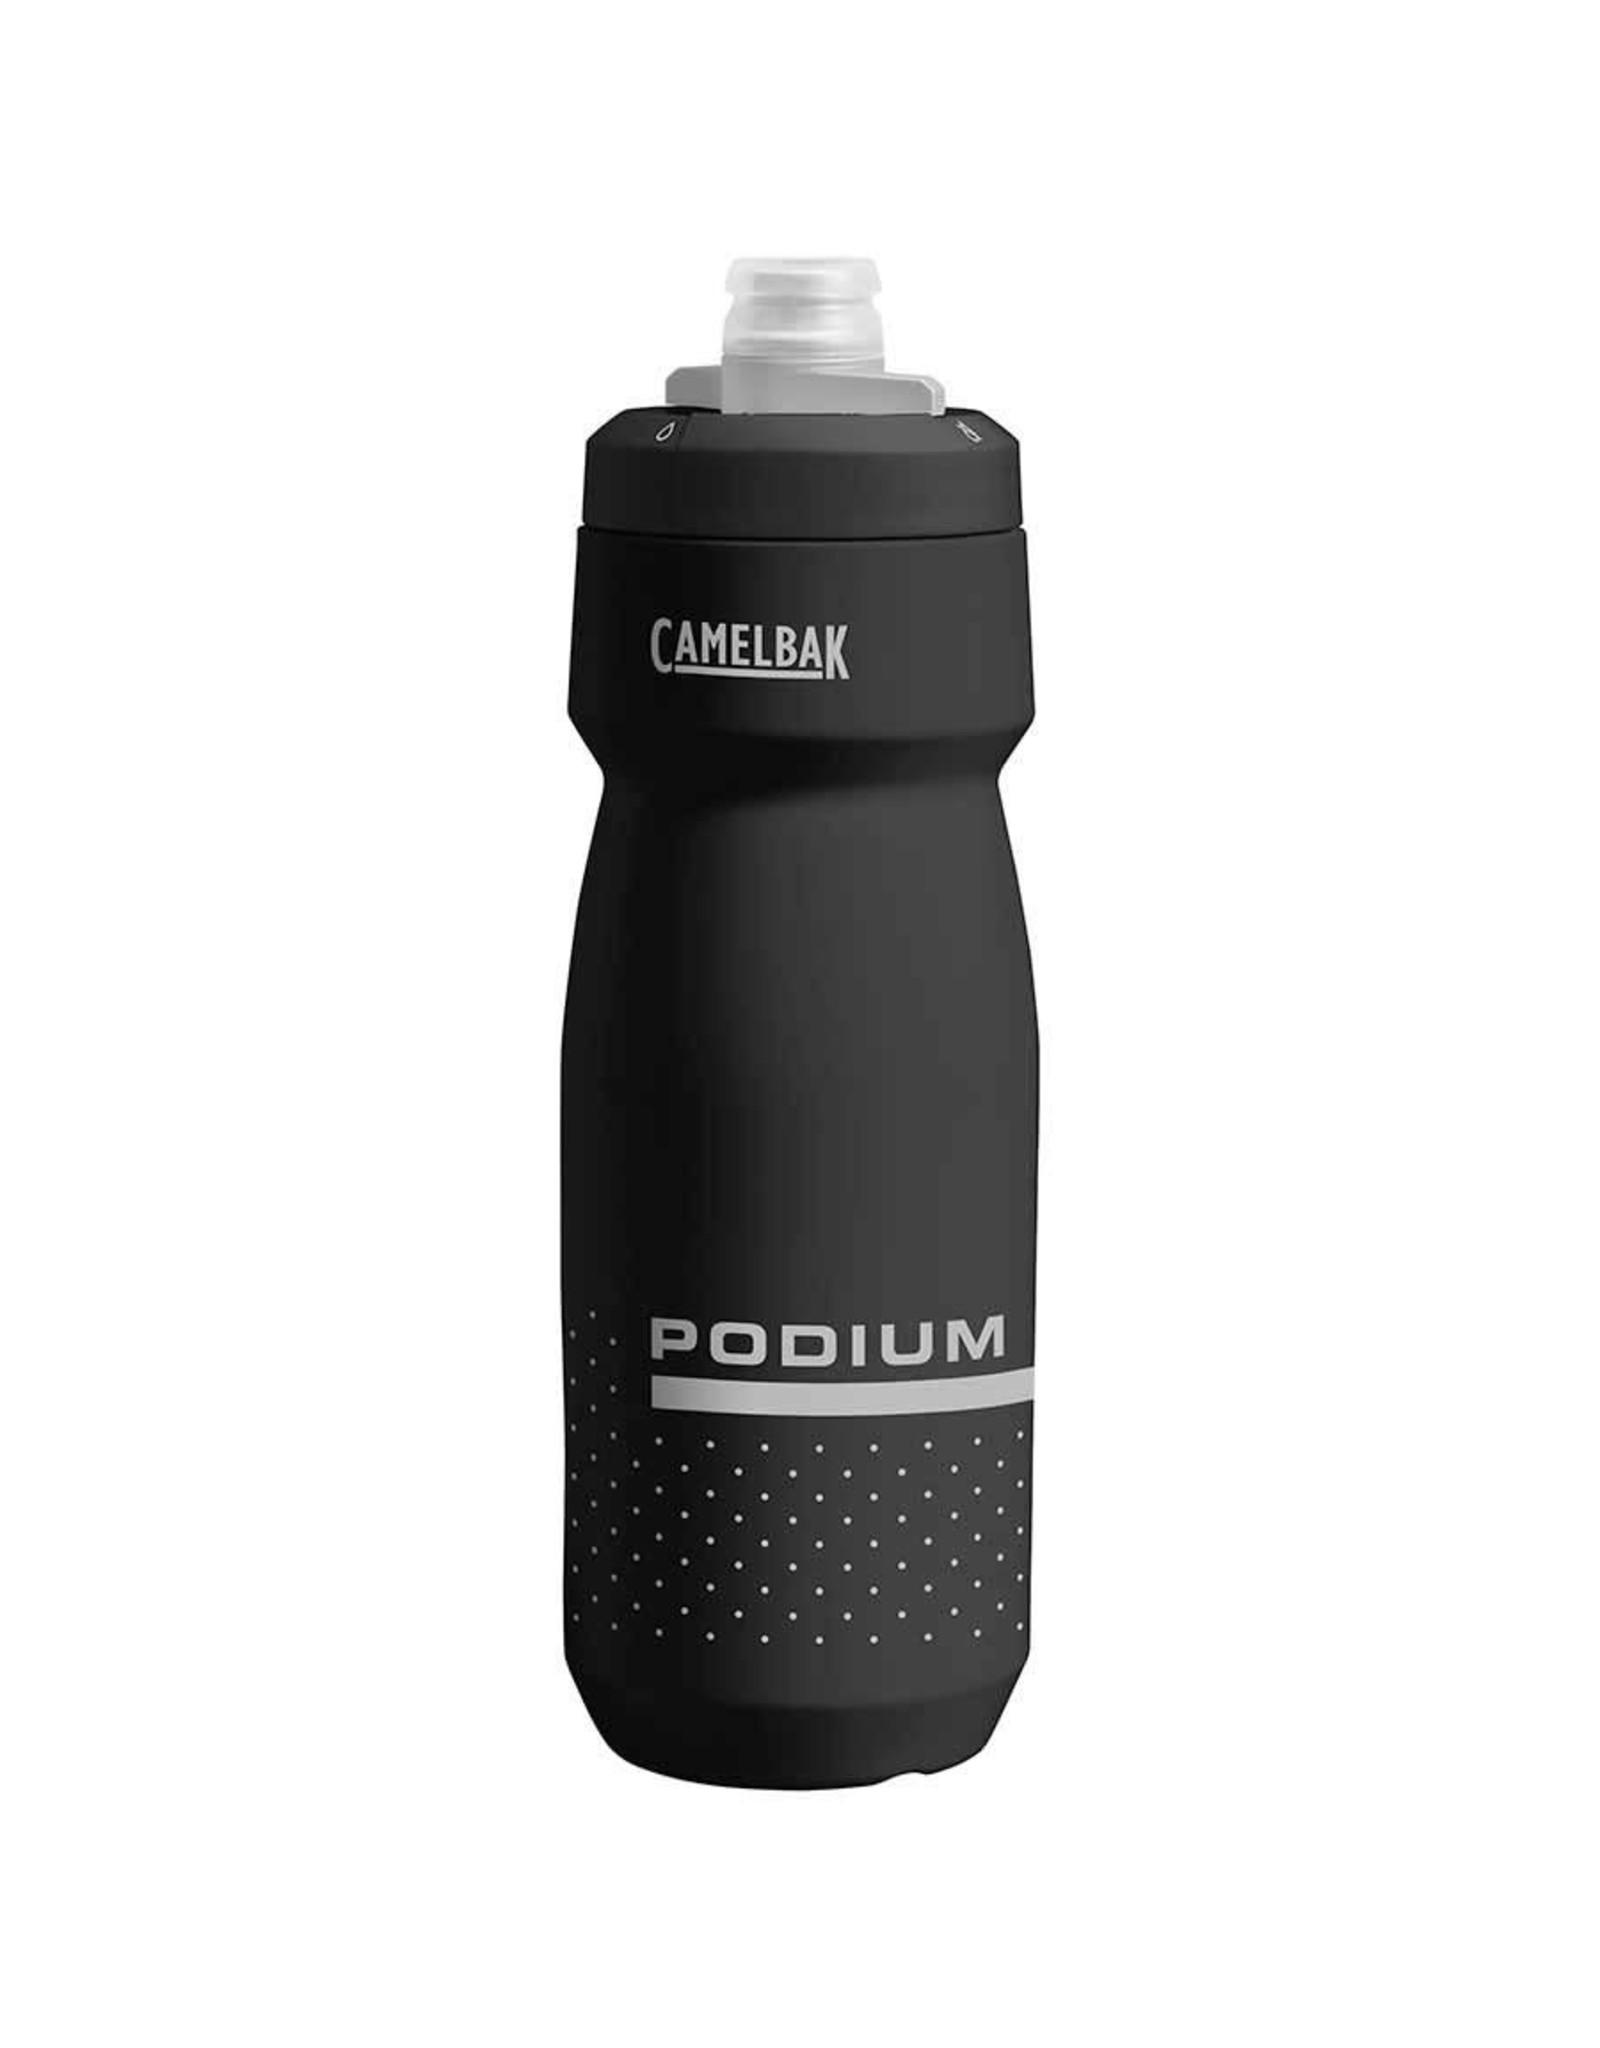 CamelBak Camelbak, Podium, Water bottle